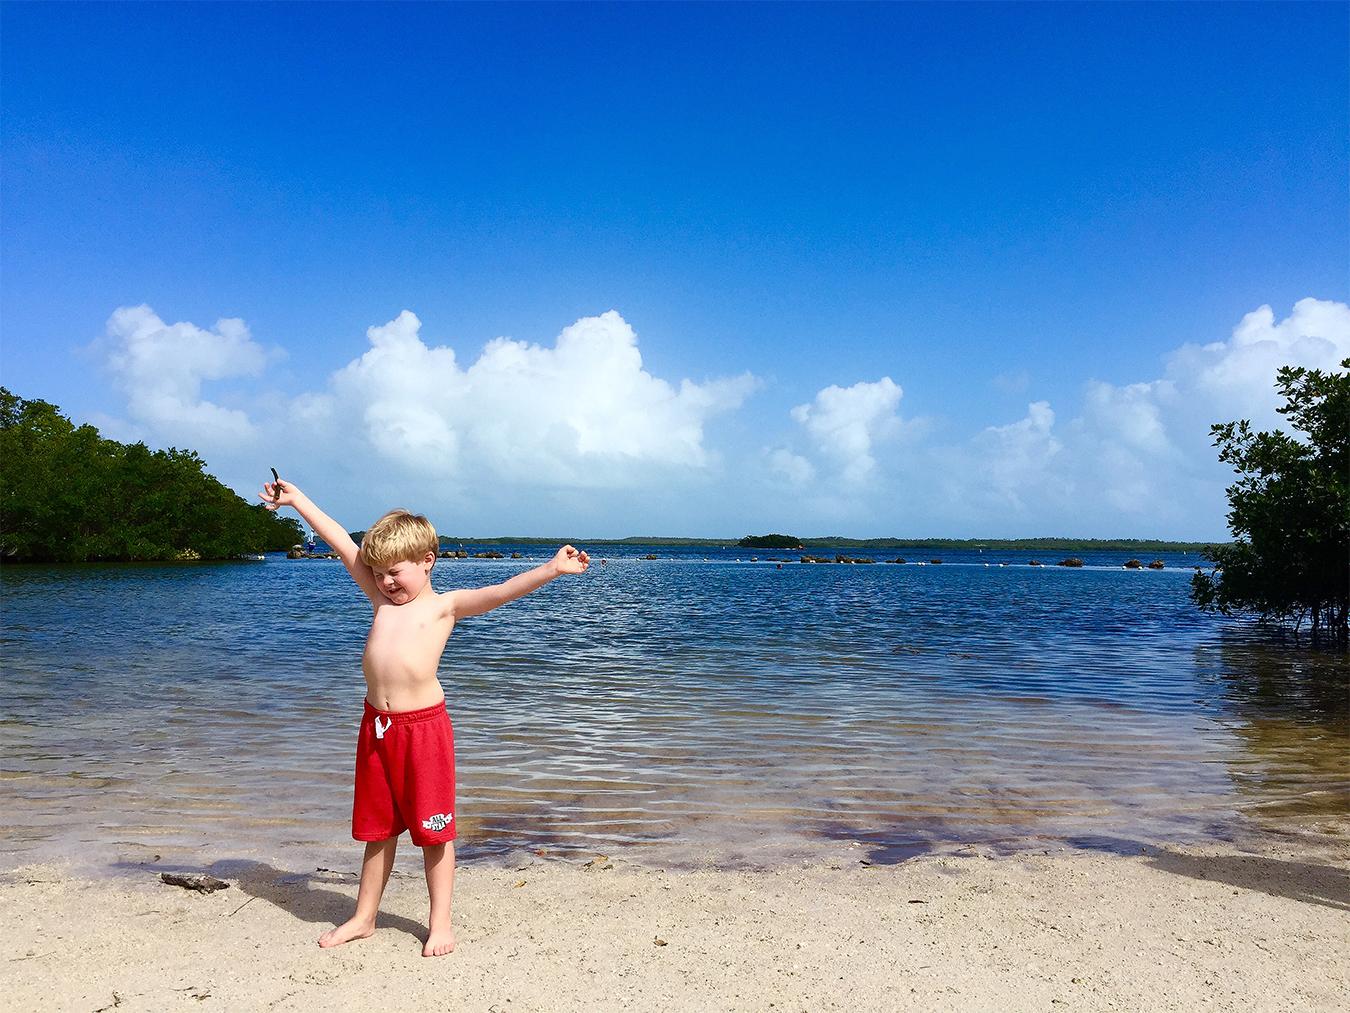 7_Mu_Qiao_travel_Photography_Miami_Key_West_Florida_boy_swimming